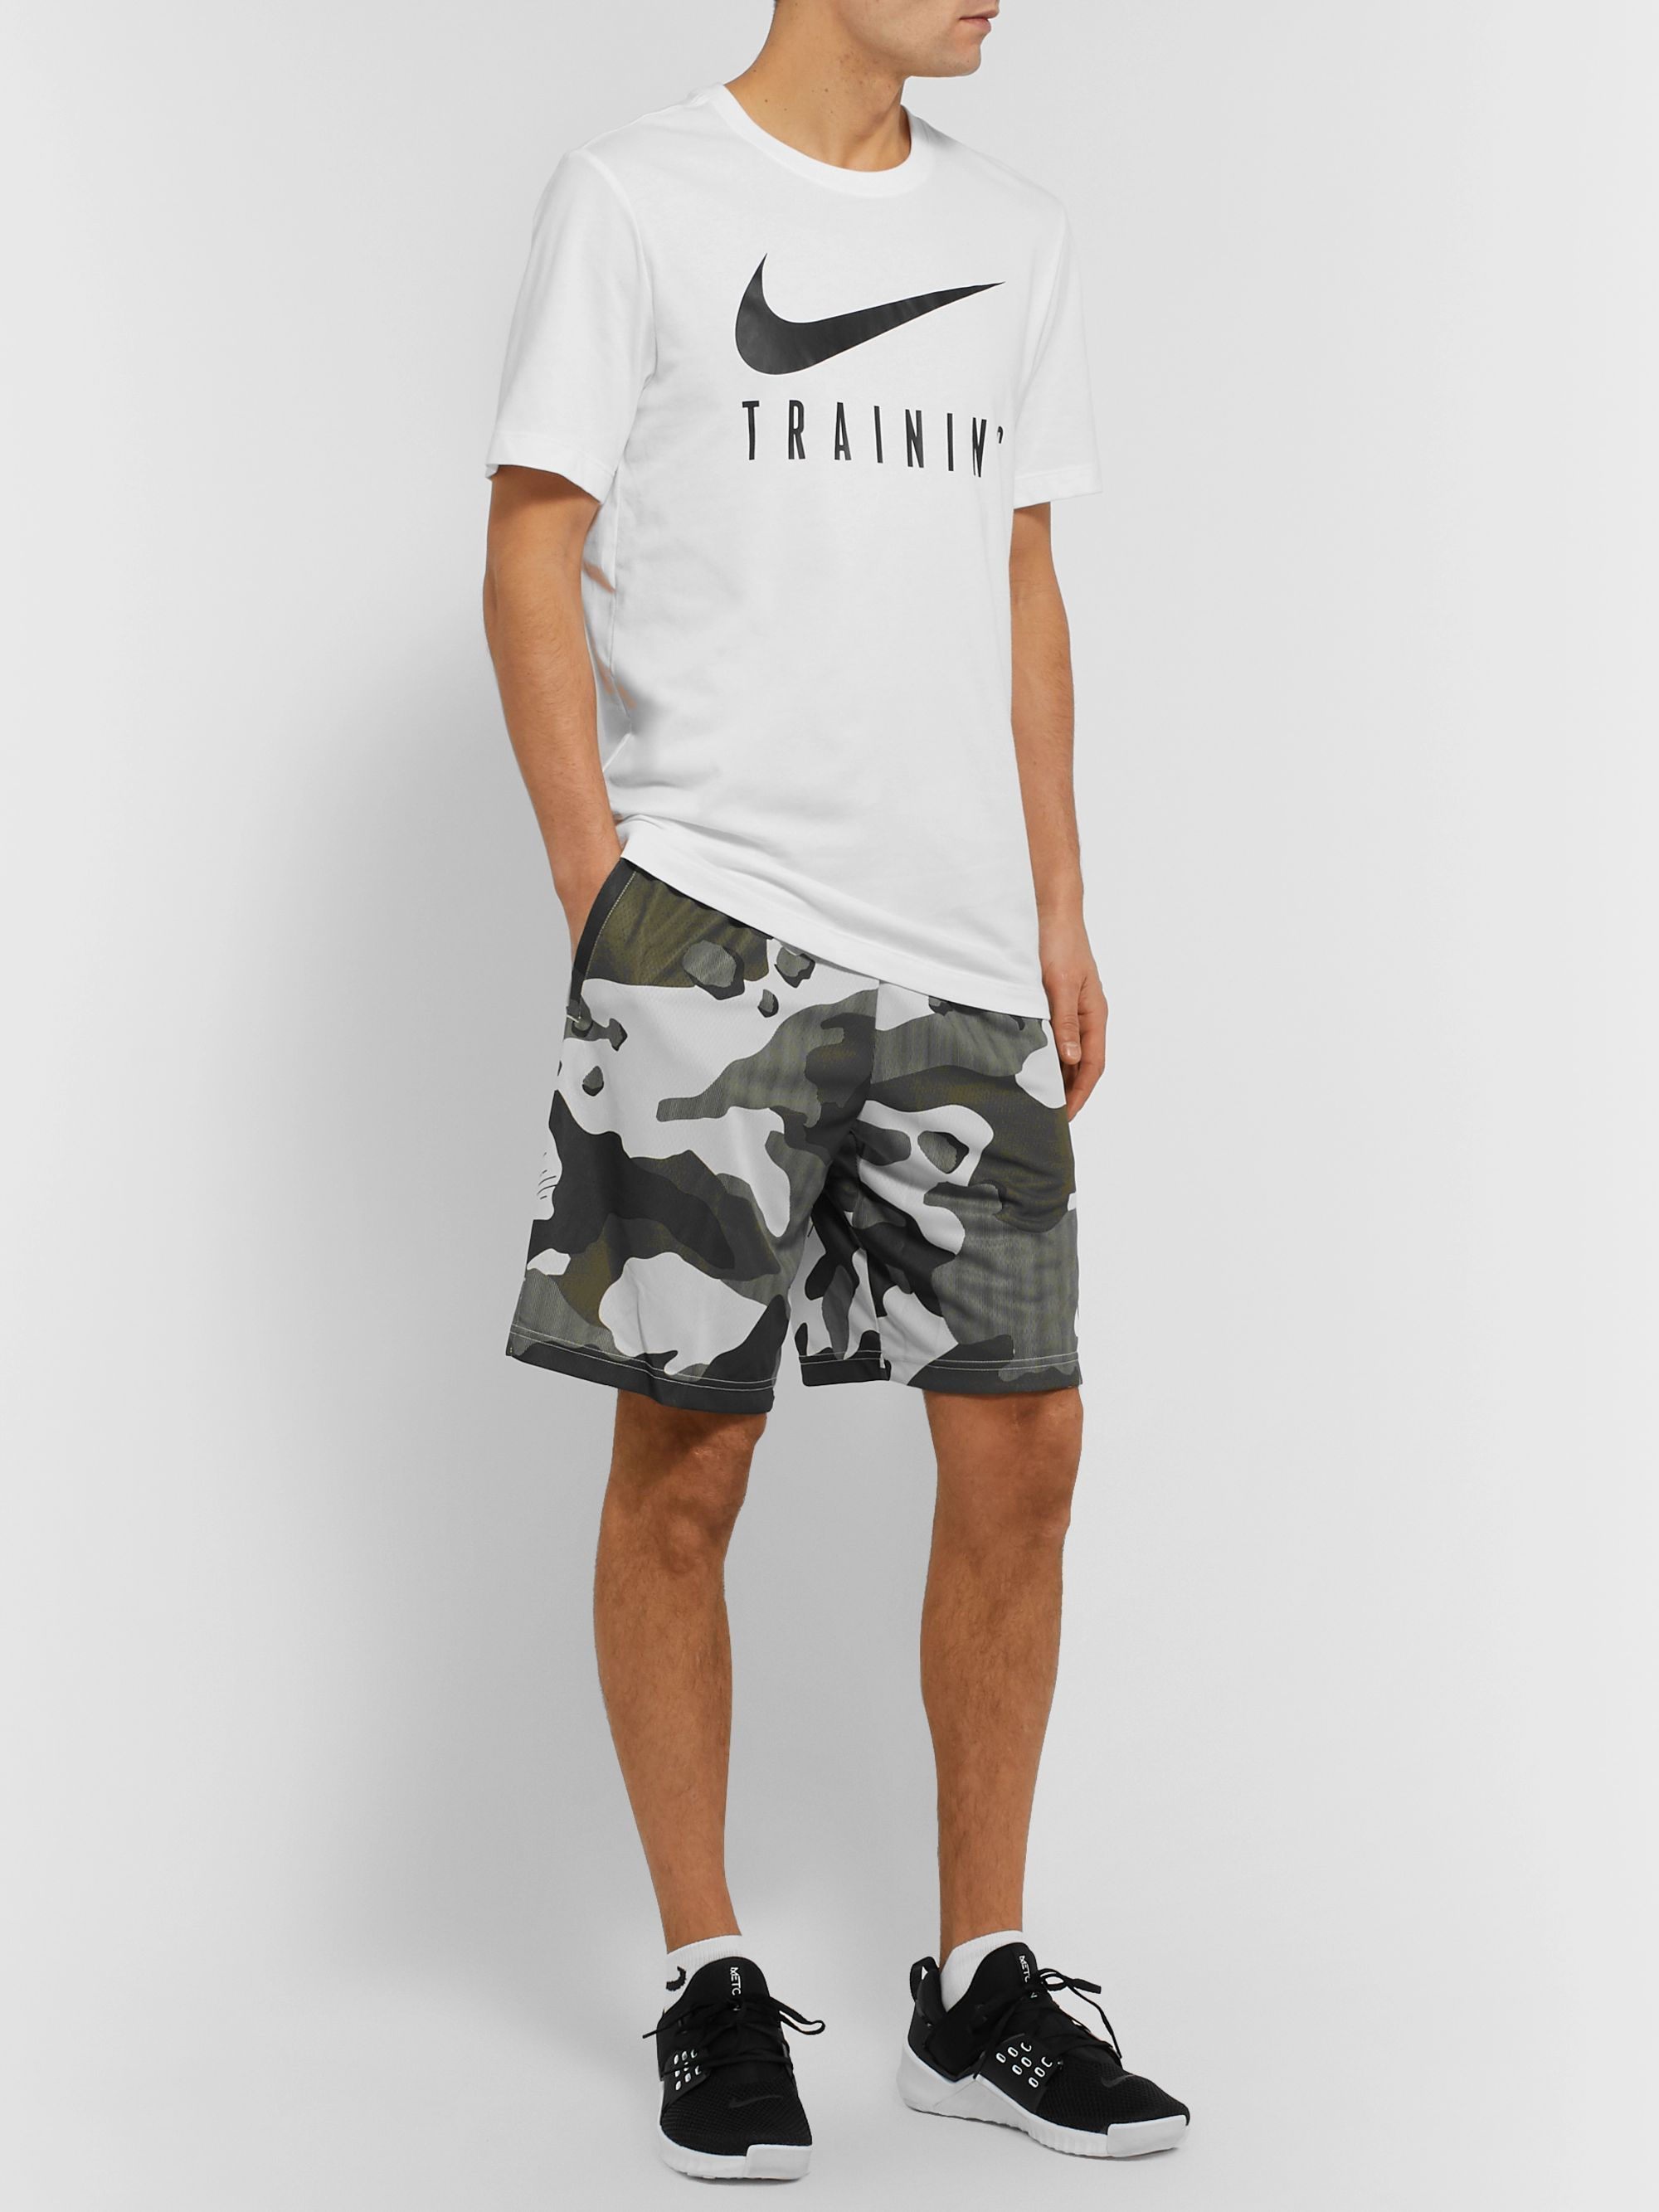 Gray Camouflage Print Dri FIT Shorts | Nike Training | MR PORTER